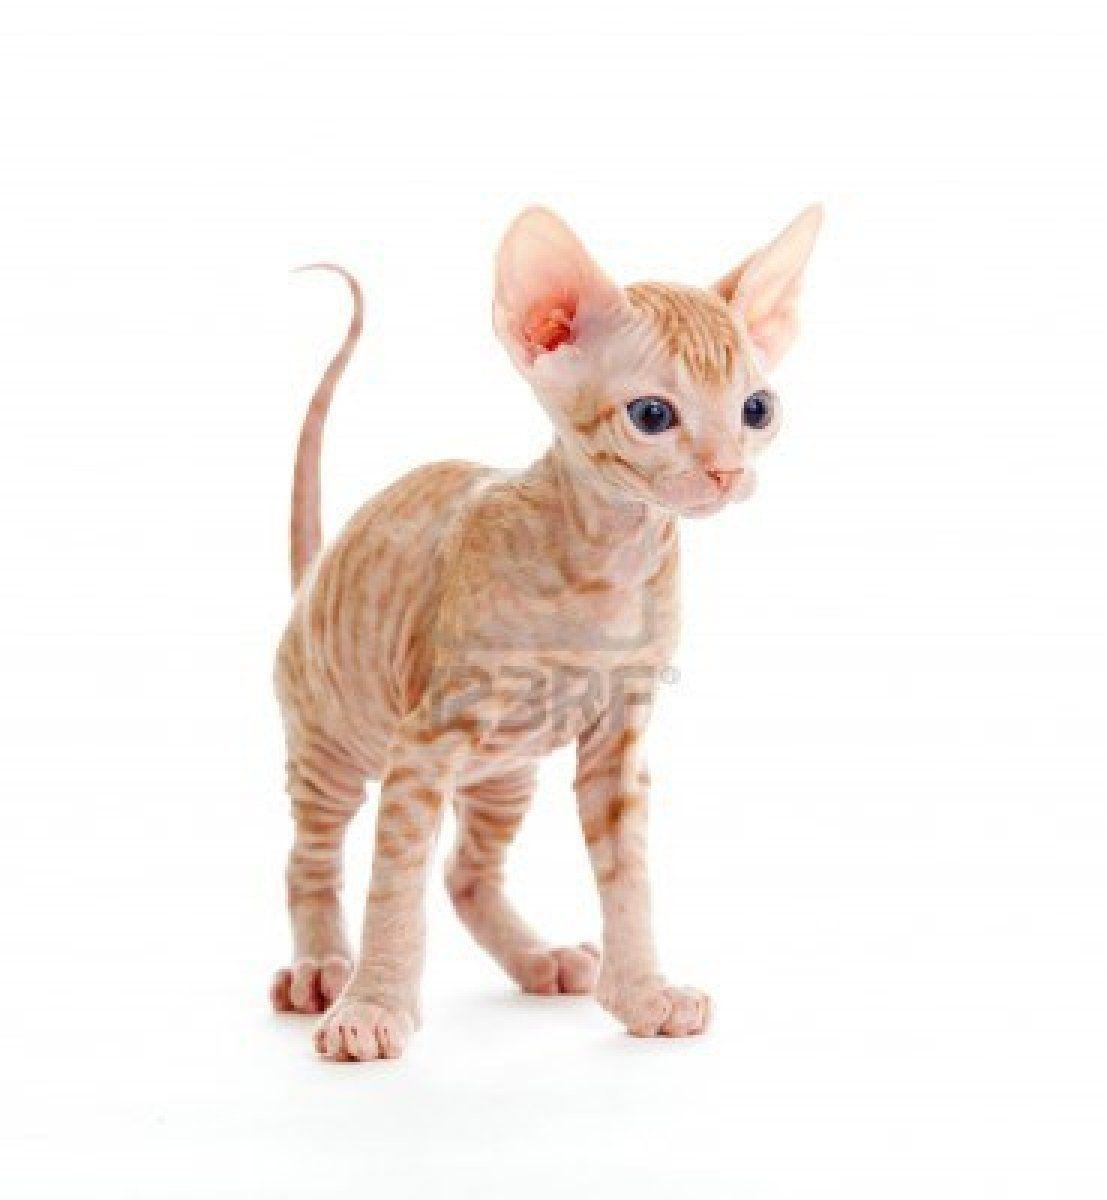 Funny Hairless Sphynx Tabby Kitten Isolated Tabby Kitten Tabby Kitten